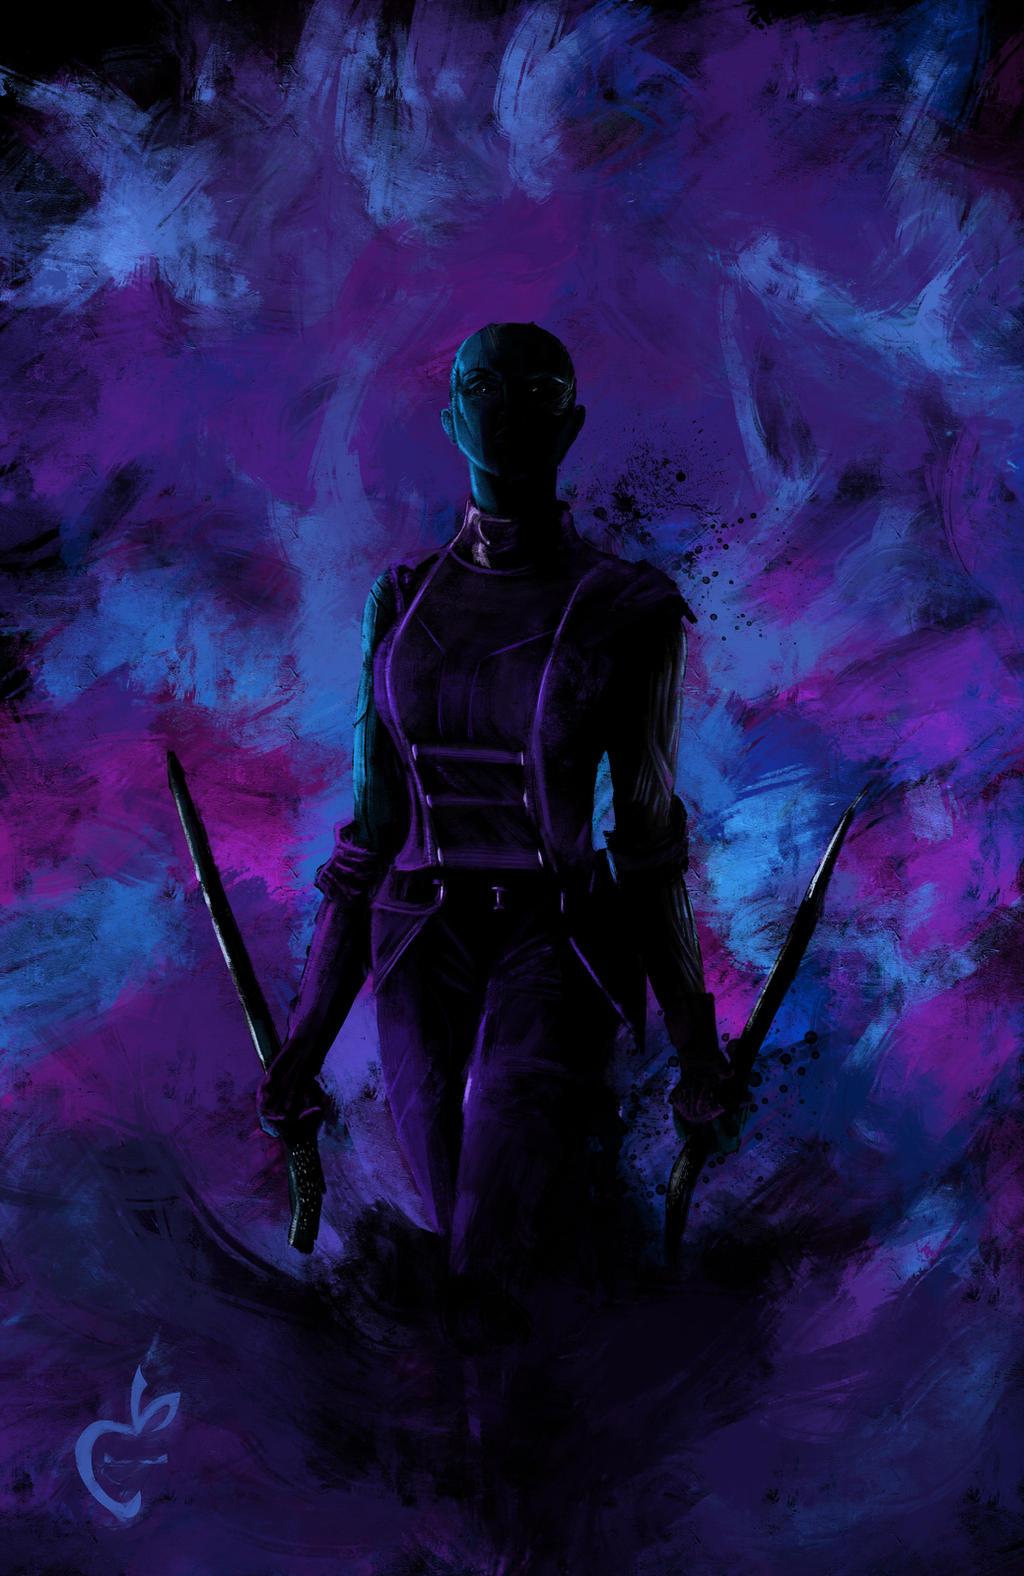 nebula villain - photo #18